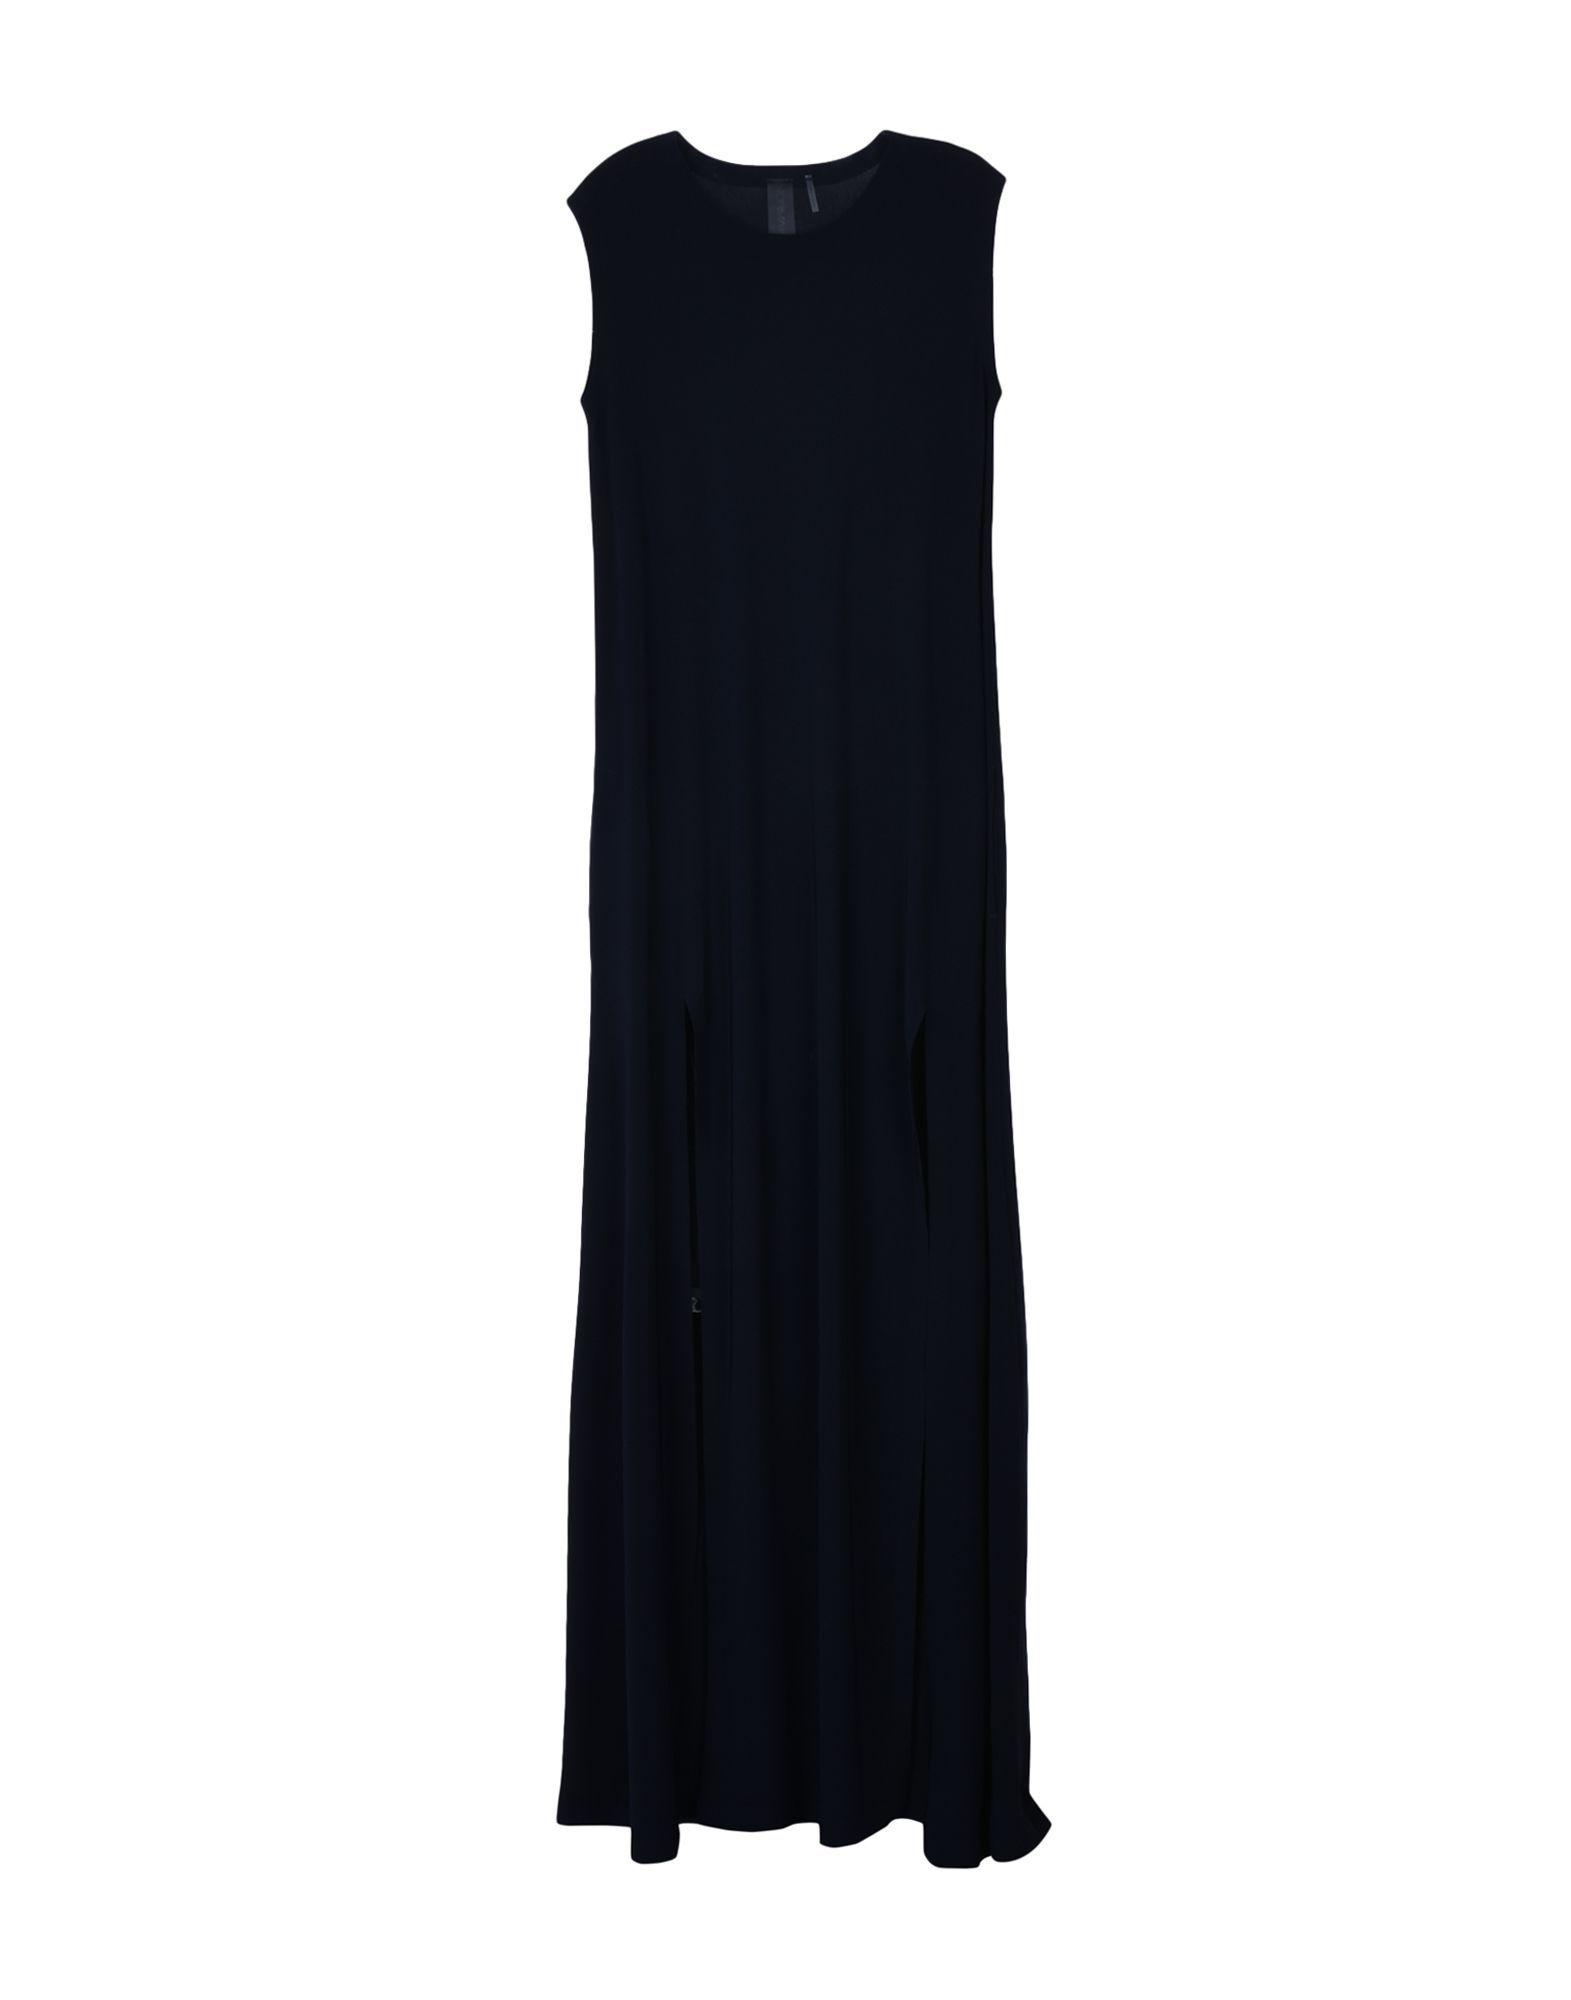 Norma Kamali Dark Blue Belted Jersey Dress